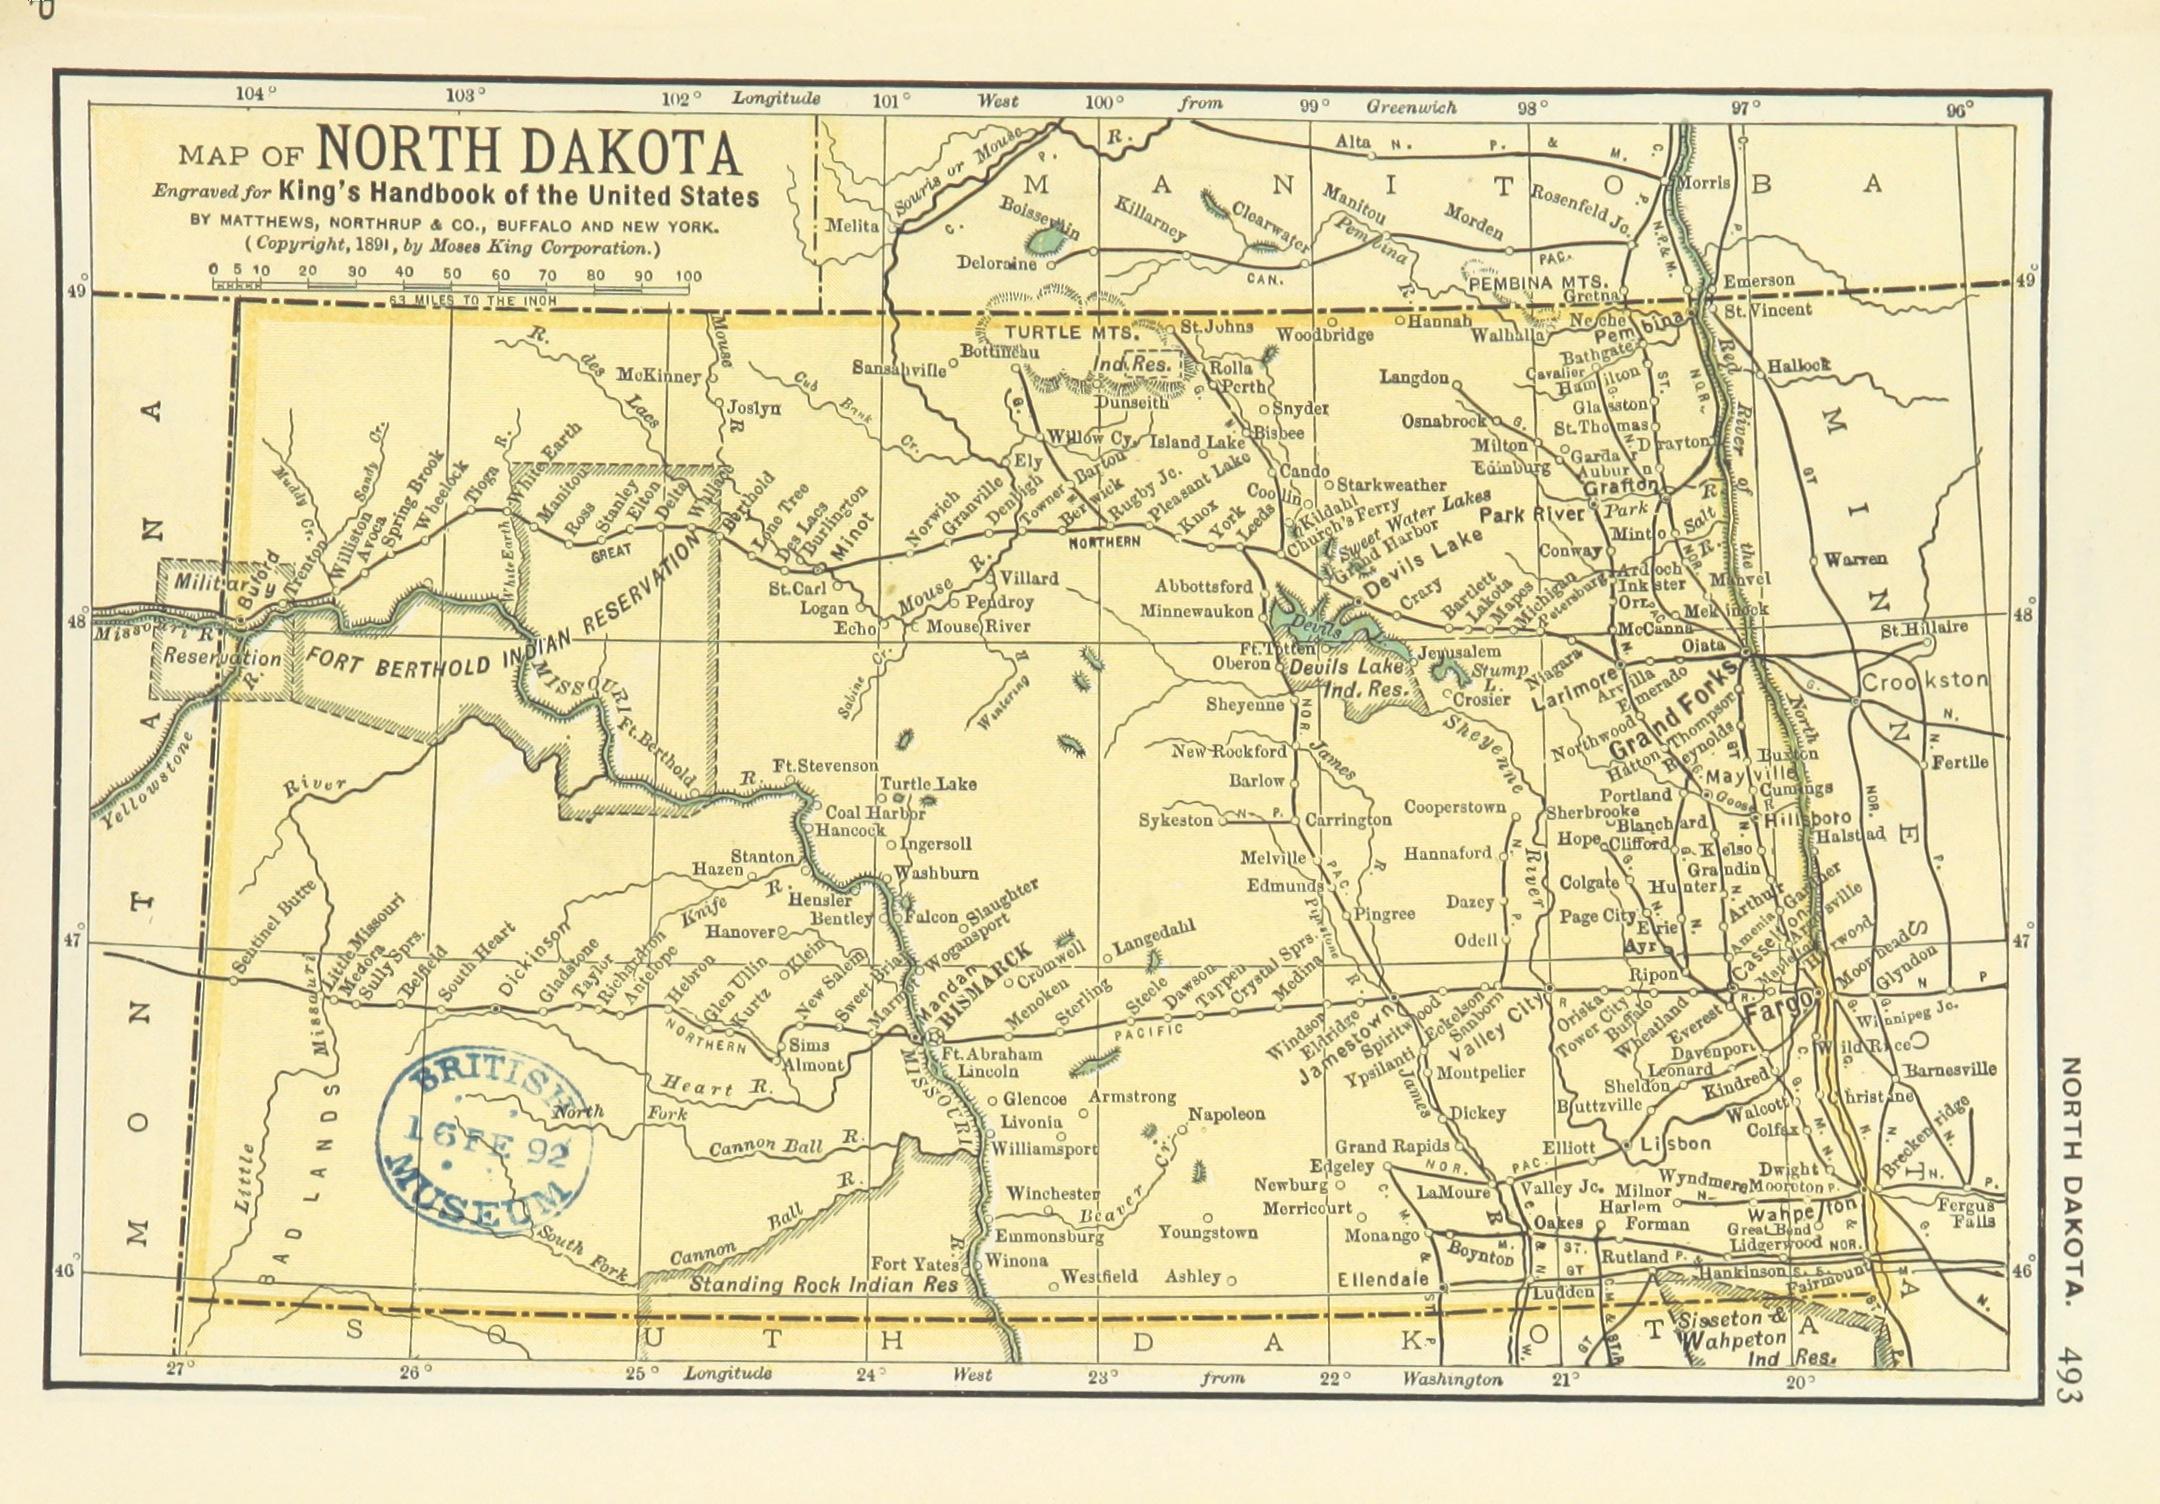 File:US-MAPS(1891) p495 - MAP OF NORTH DAKOTA.jpg - Wikimedia Commons